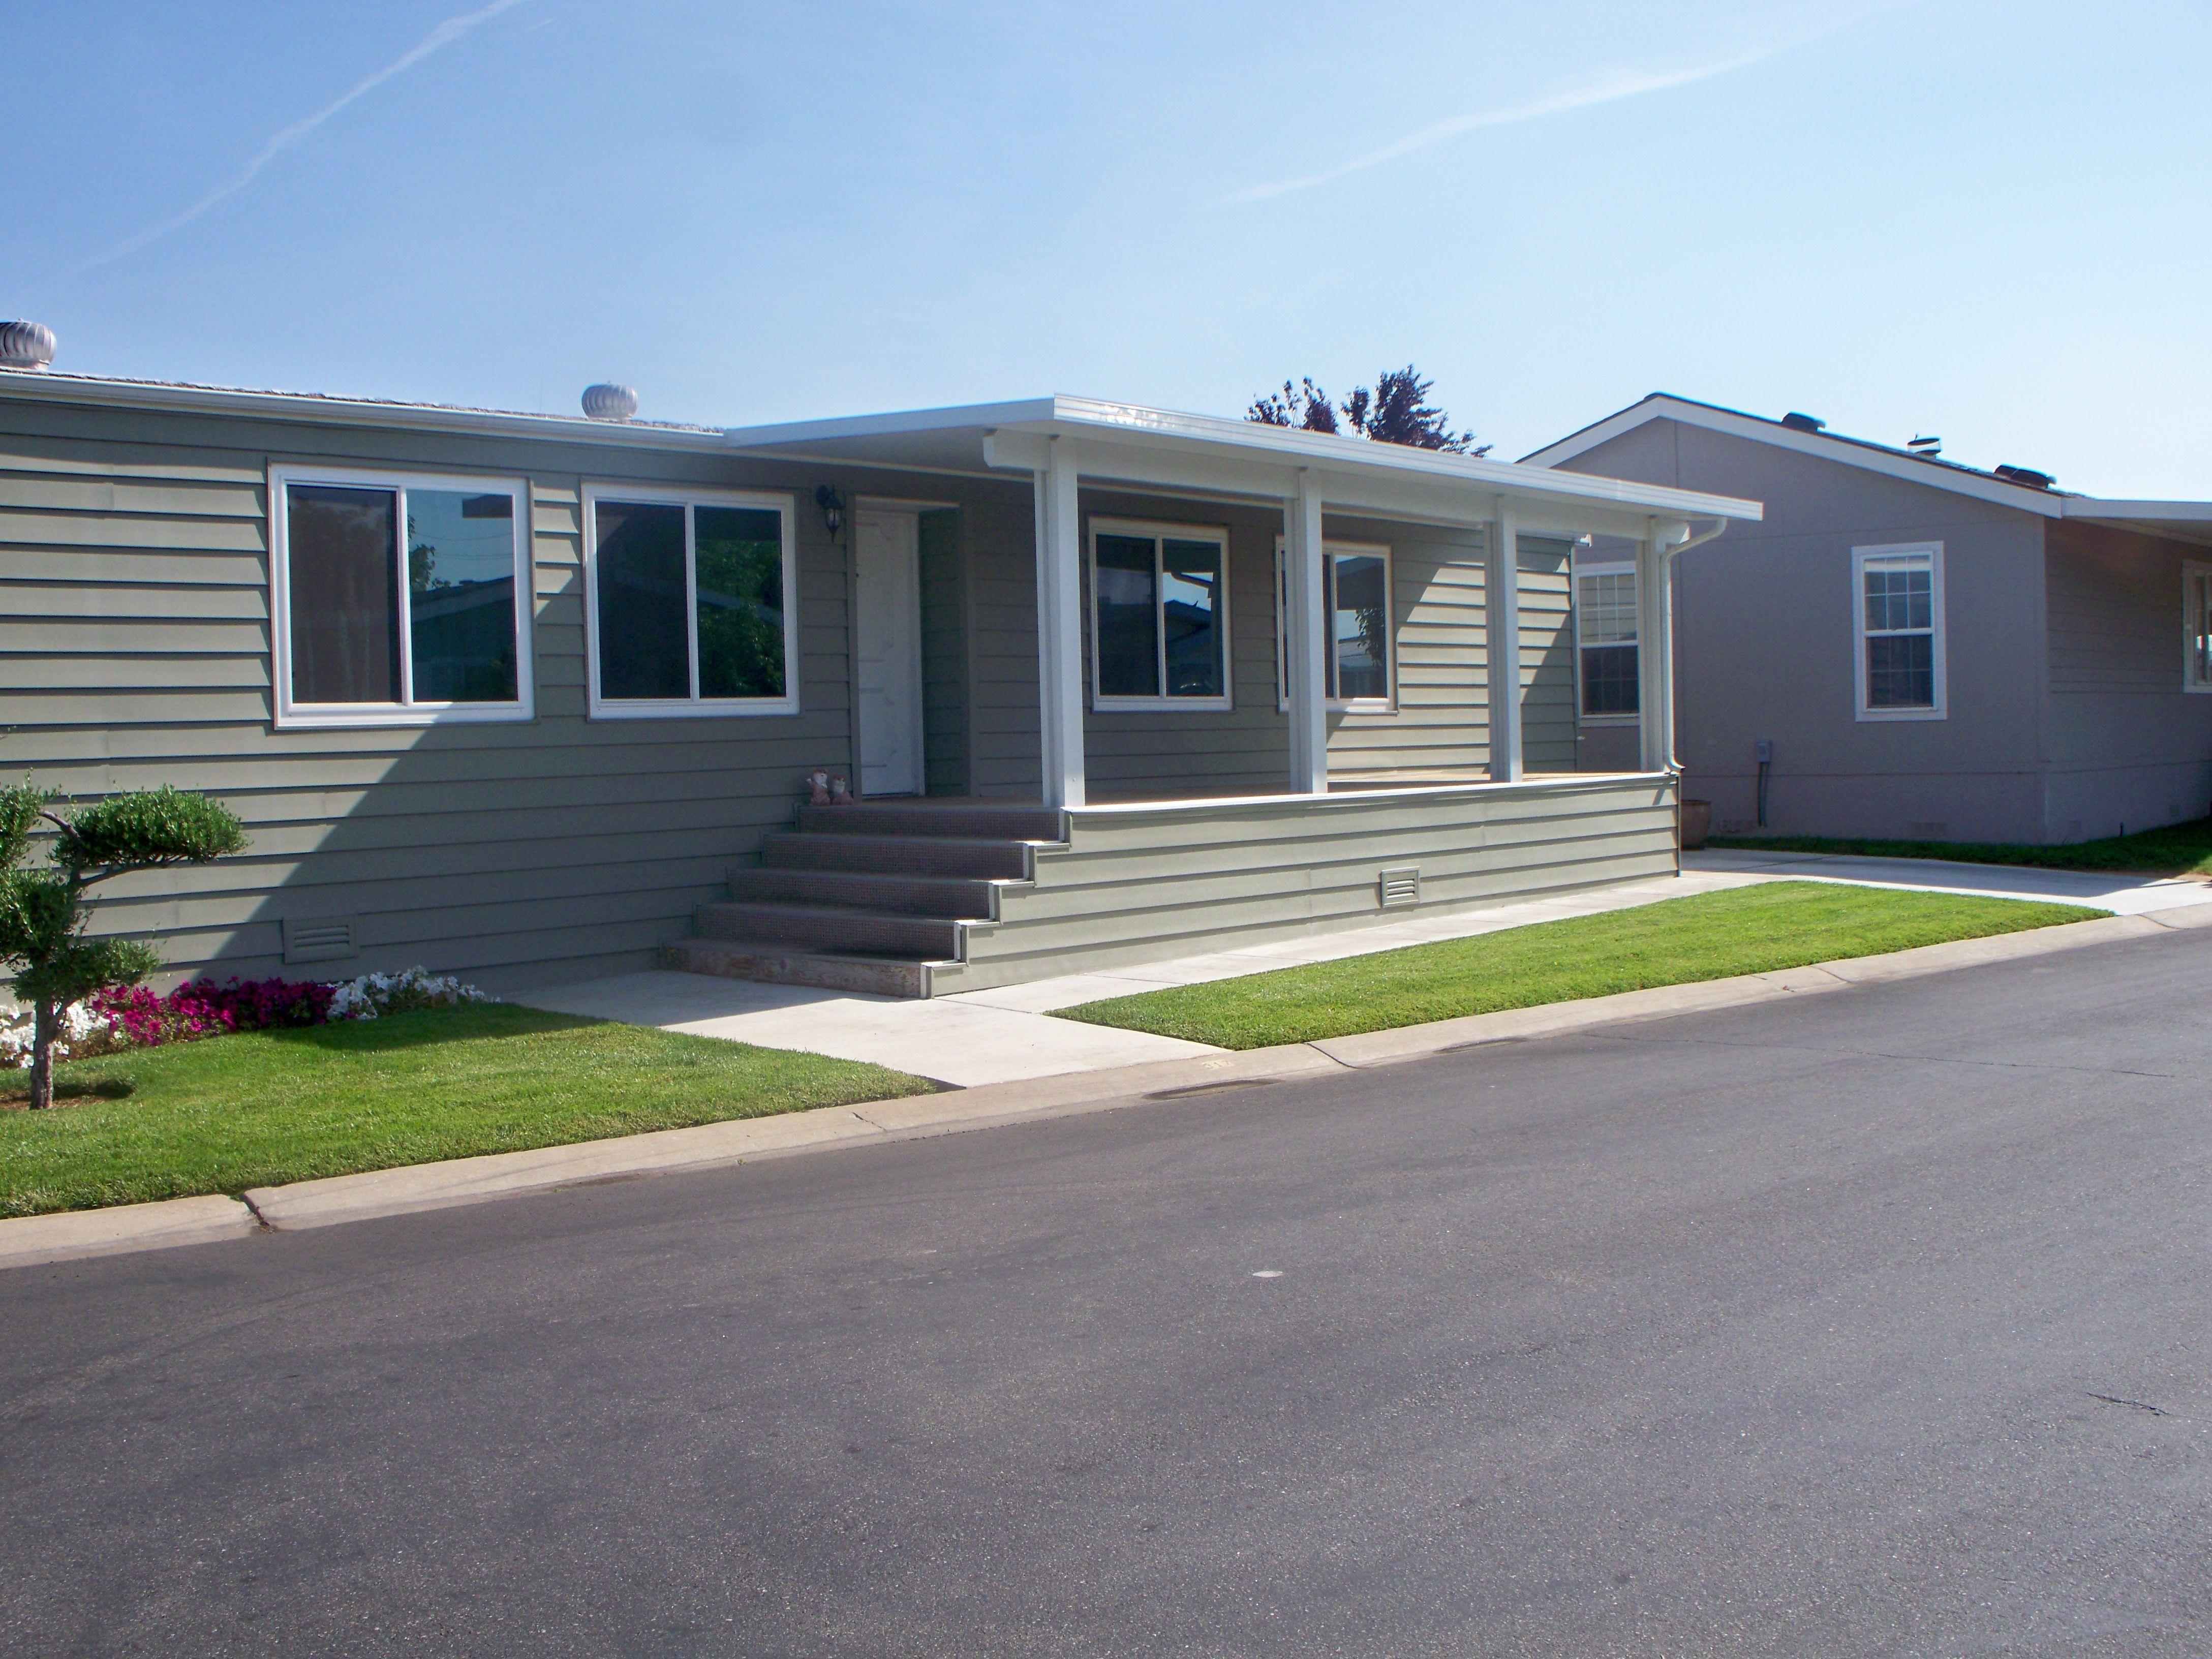 Mobile Home Remodel. Like the Front Asphalt Steps. Used Siding to ...